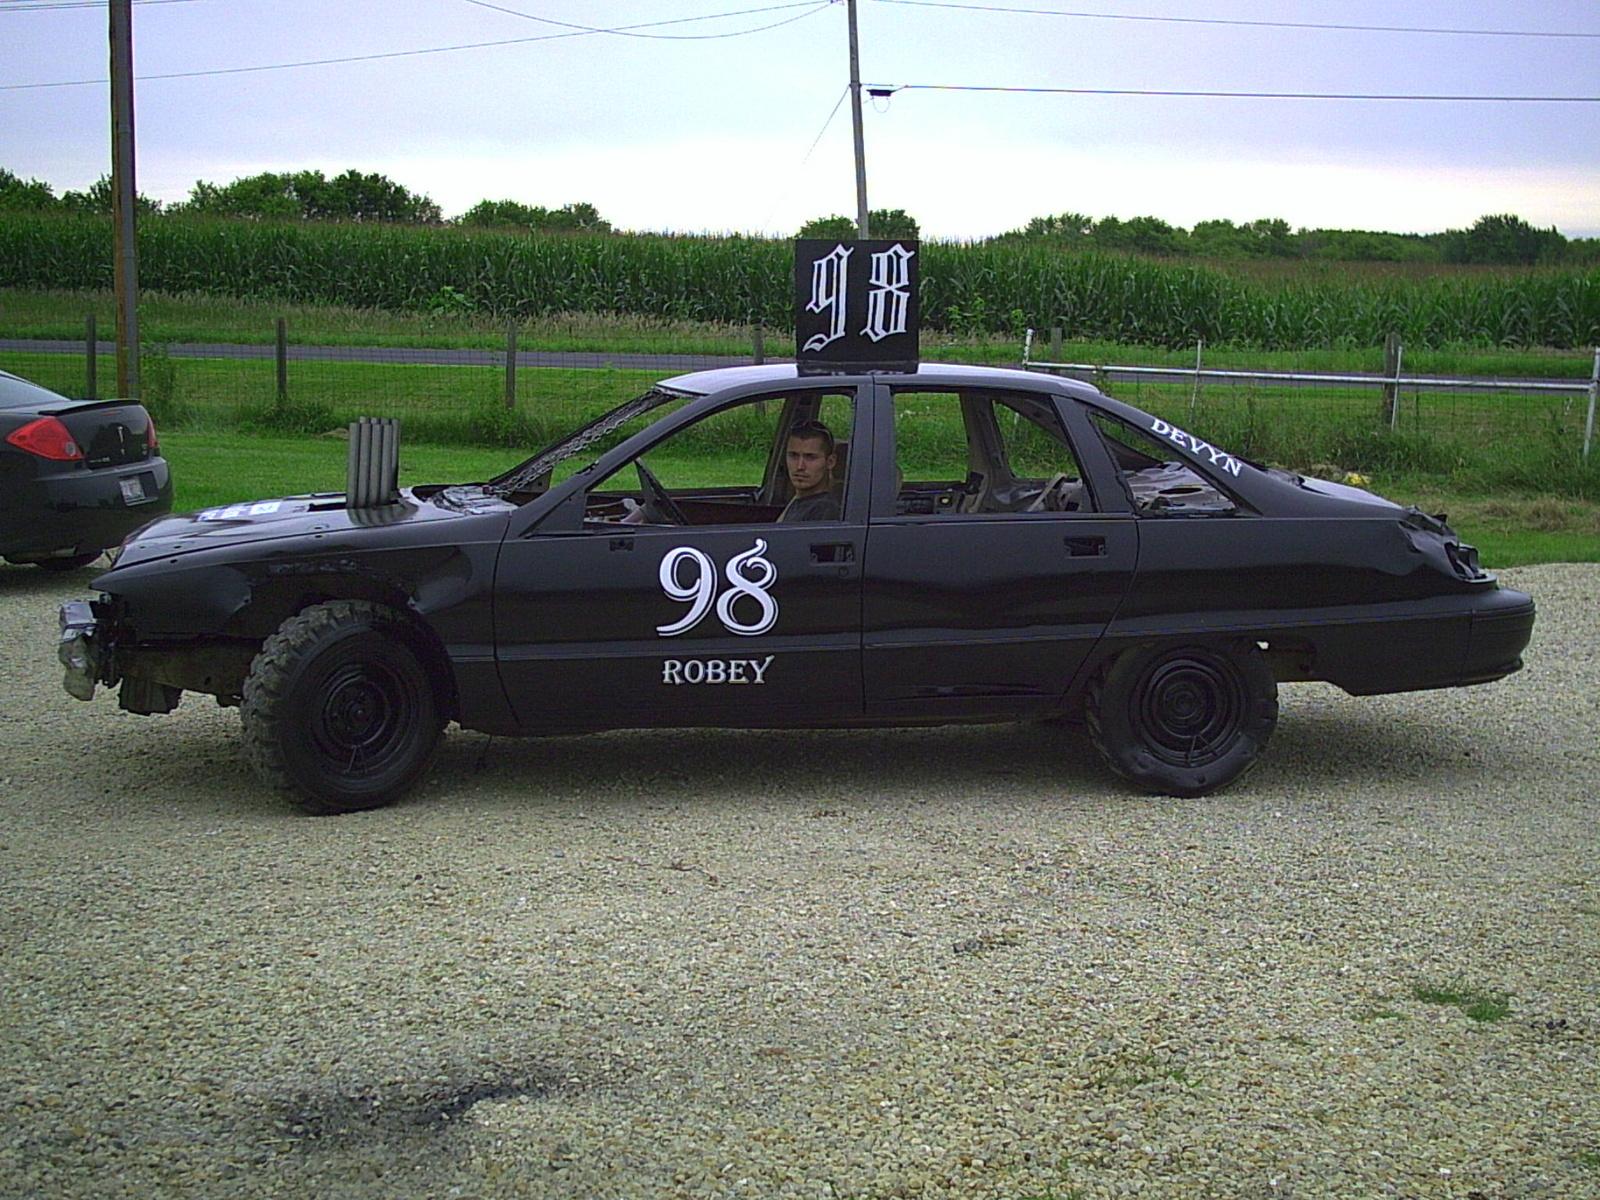 1991 Chevrolet Caprice picture